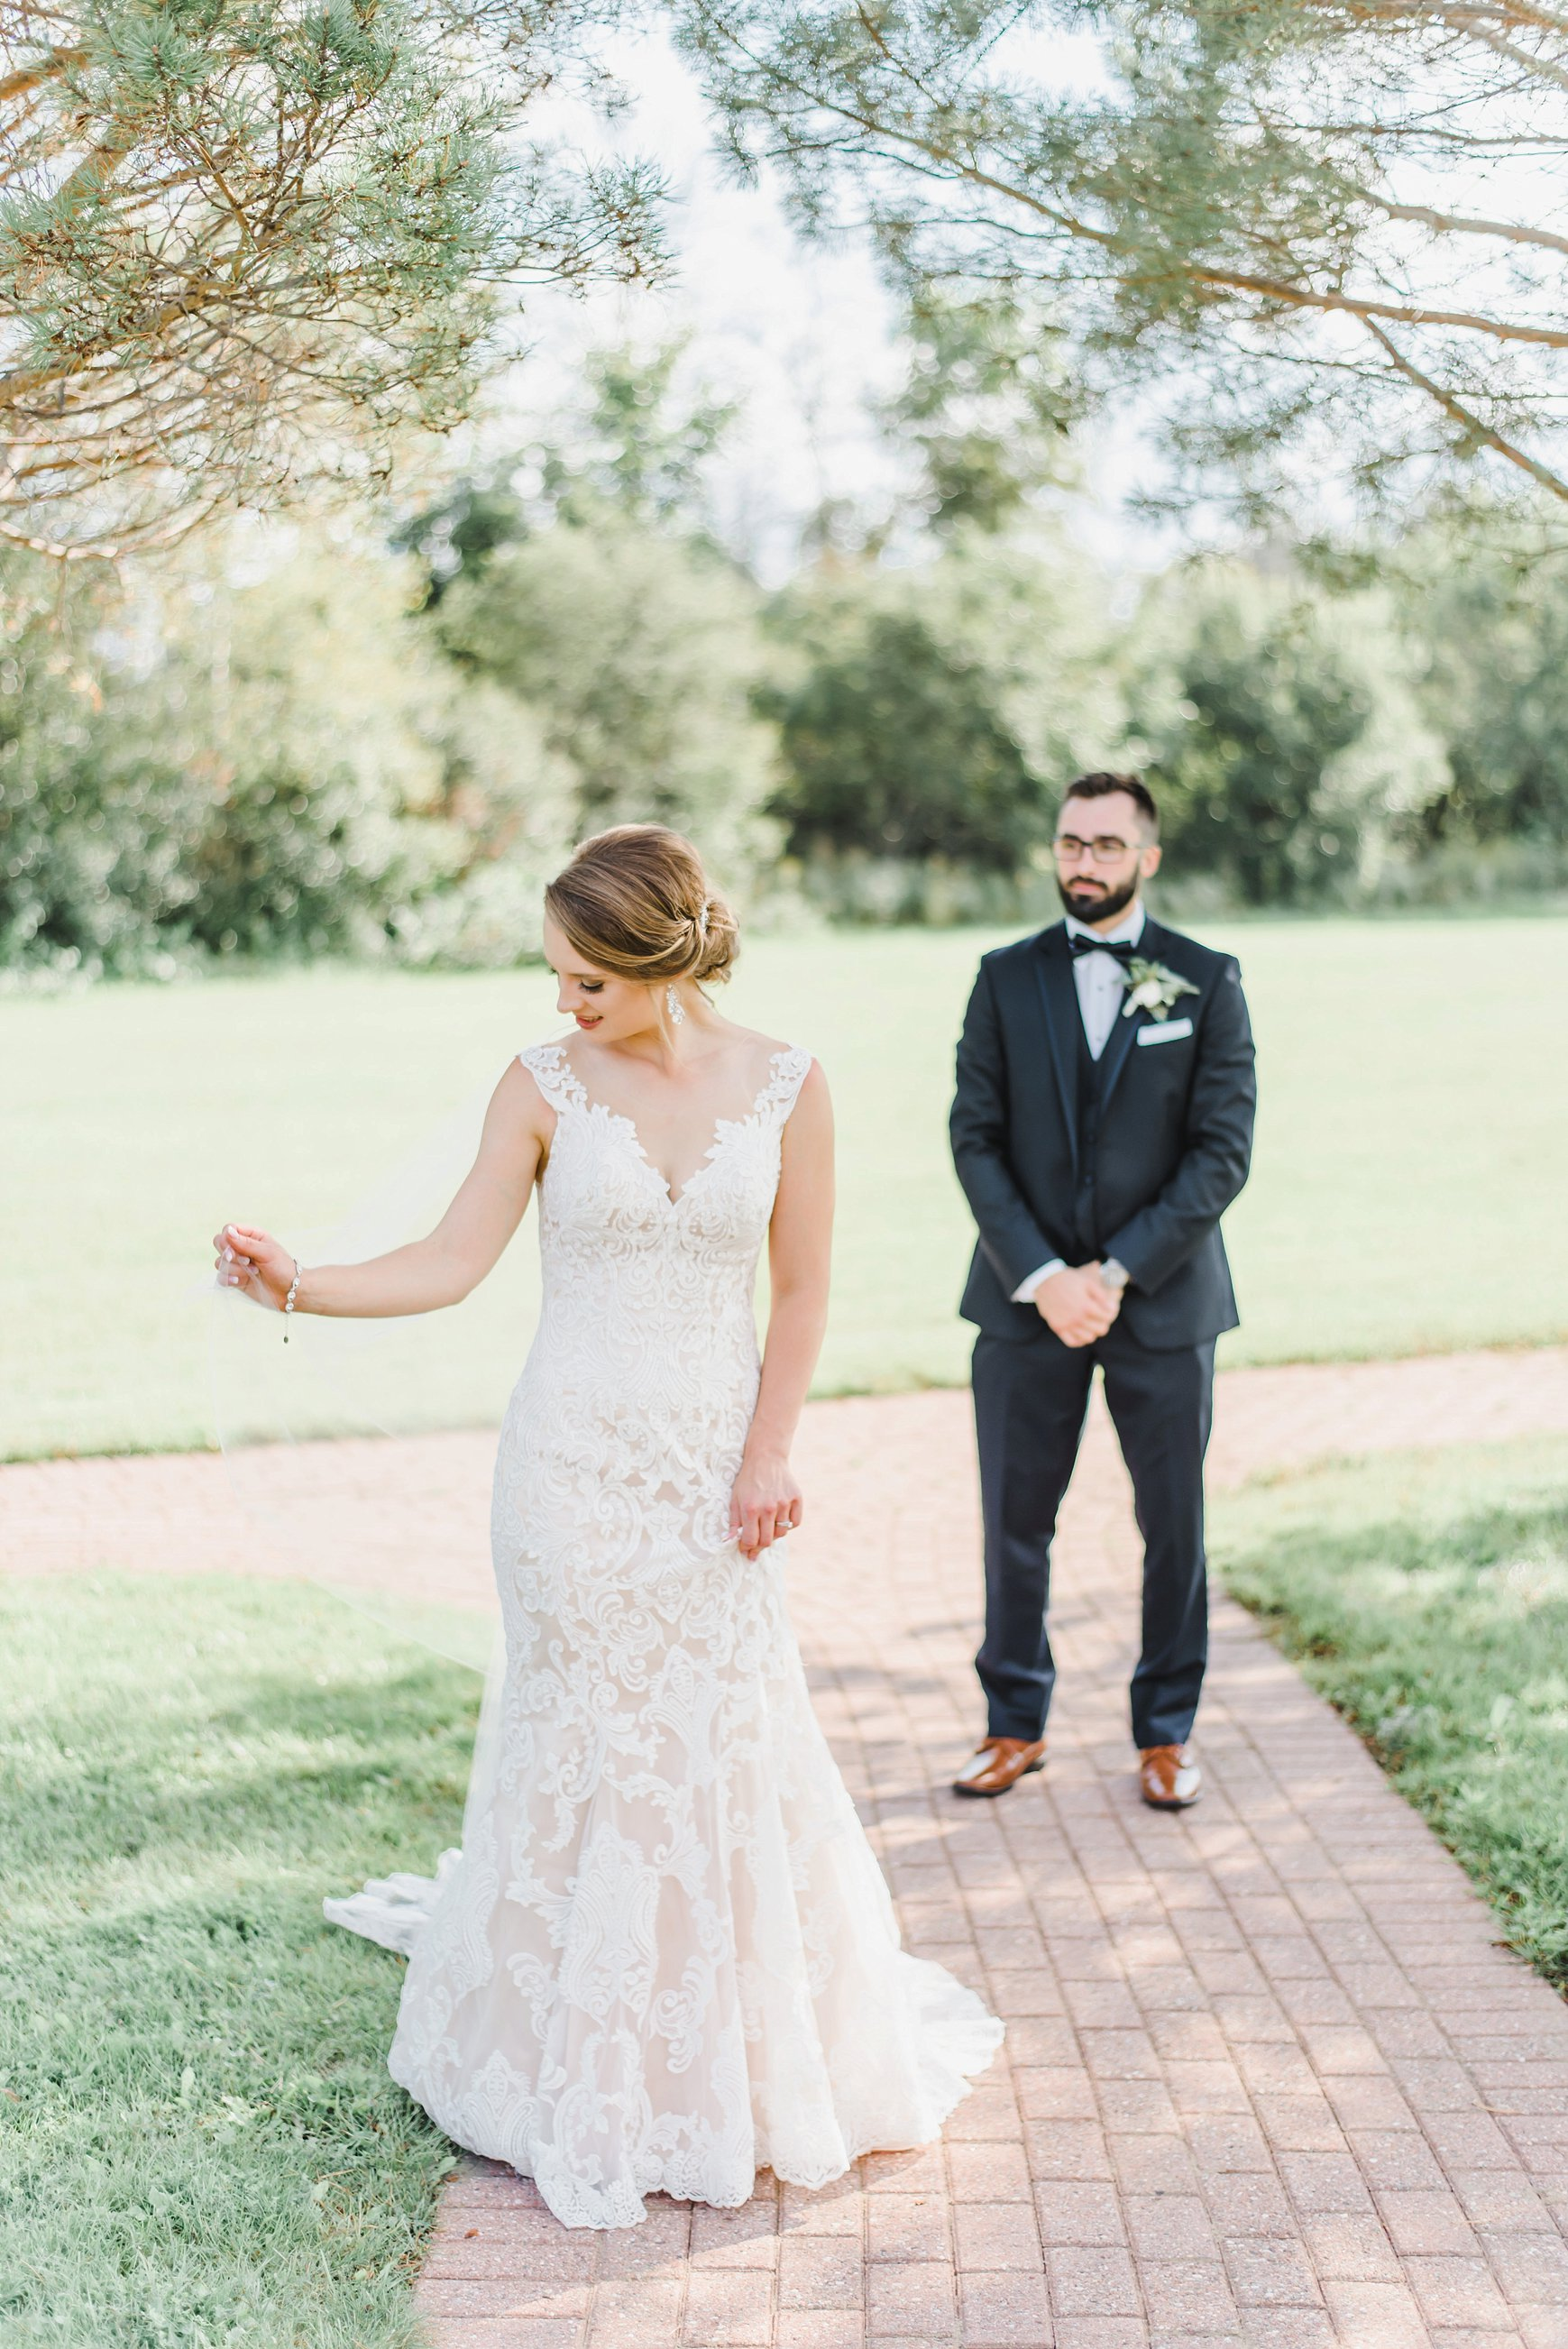 light airy indie fine art ottawa wedding photographer | Ali and Batoul Photography_1309.jpg